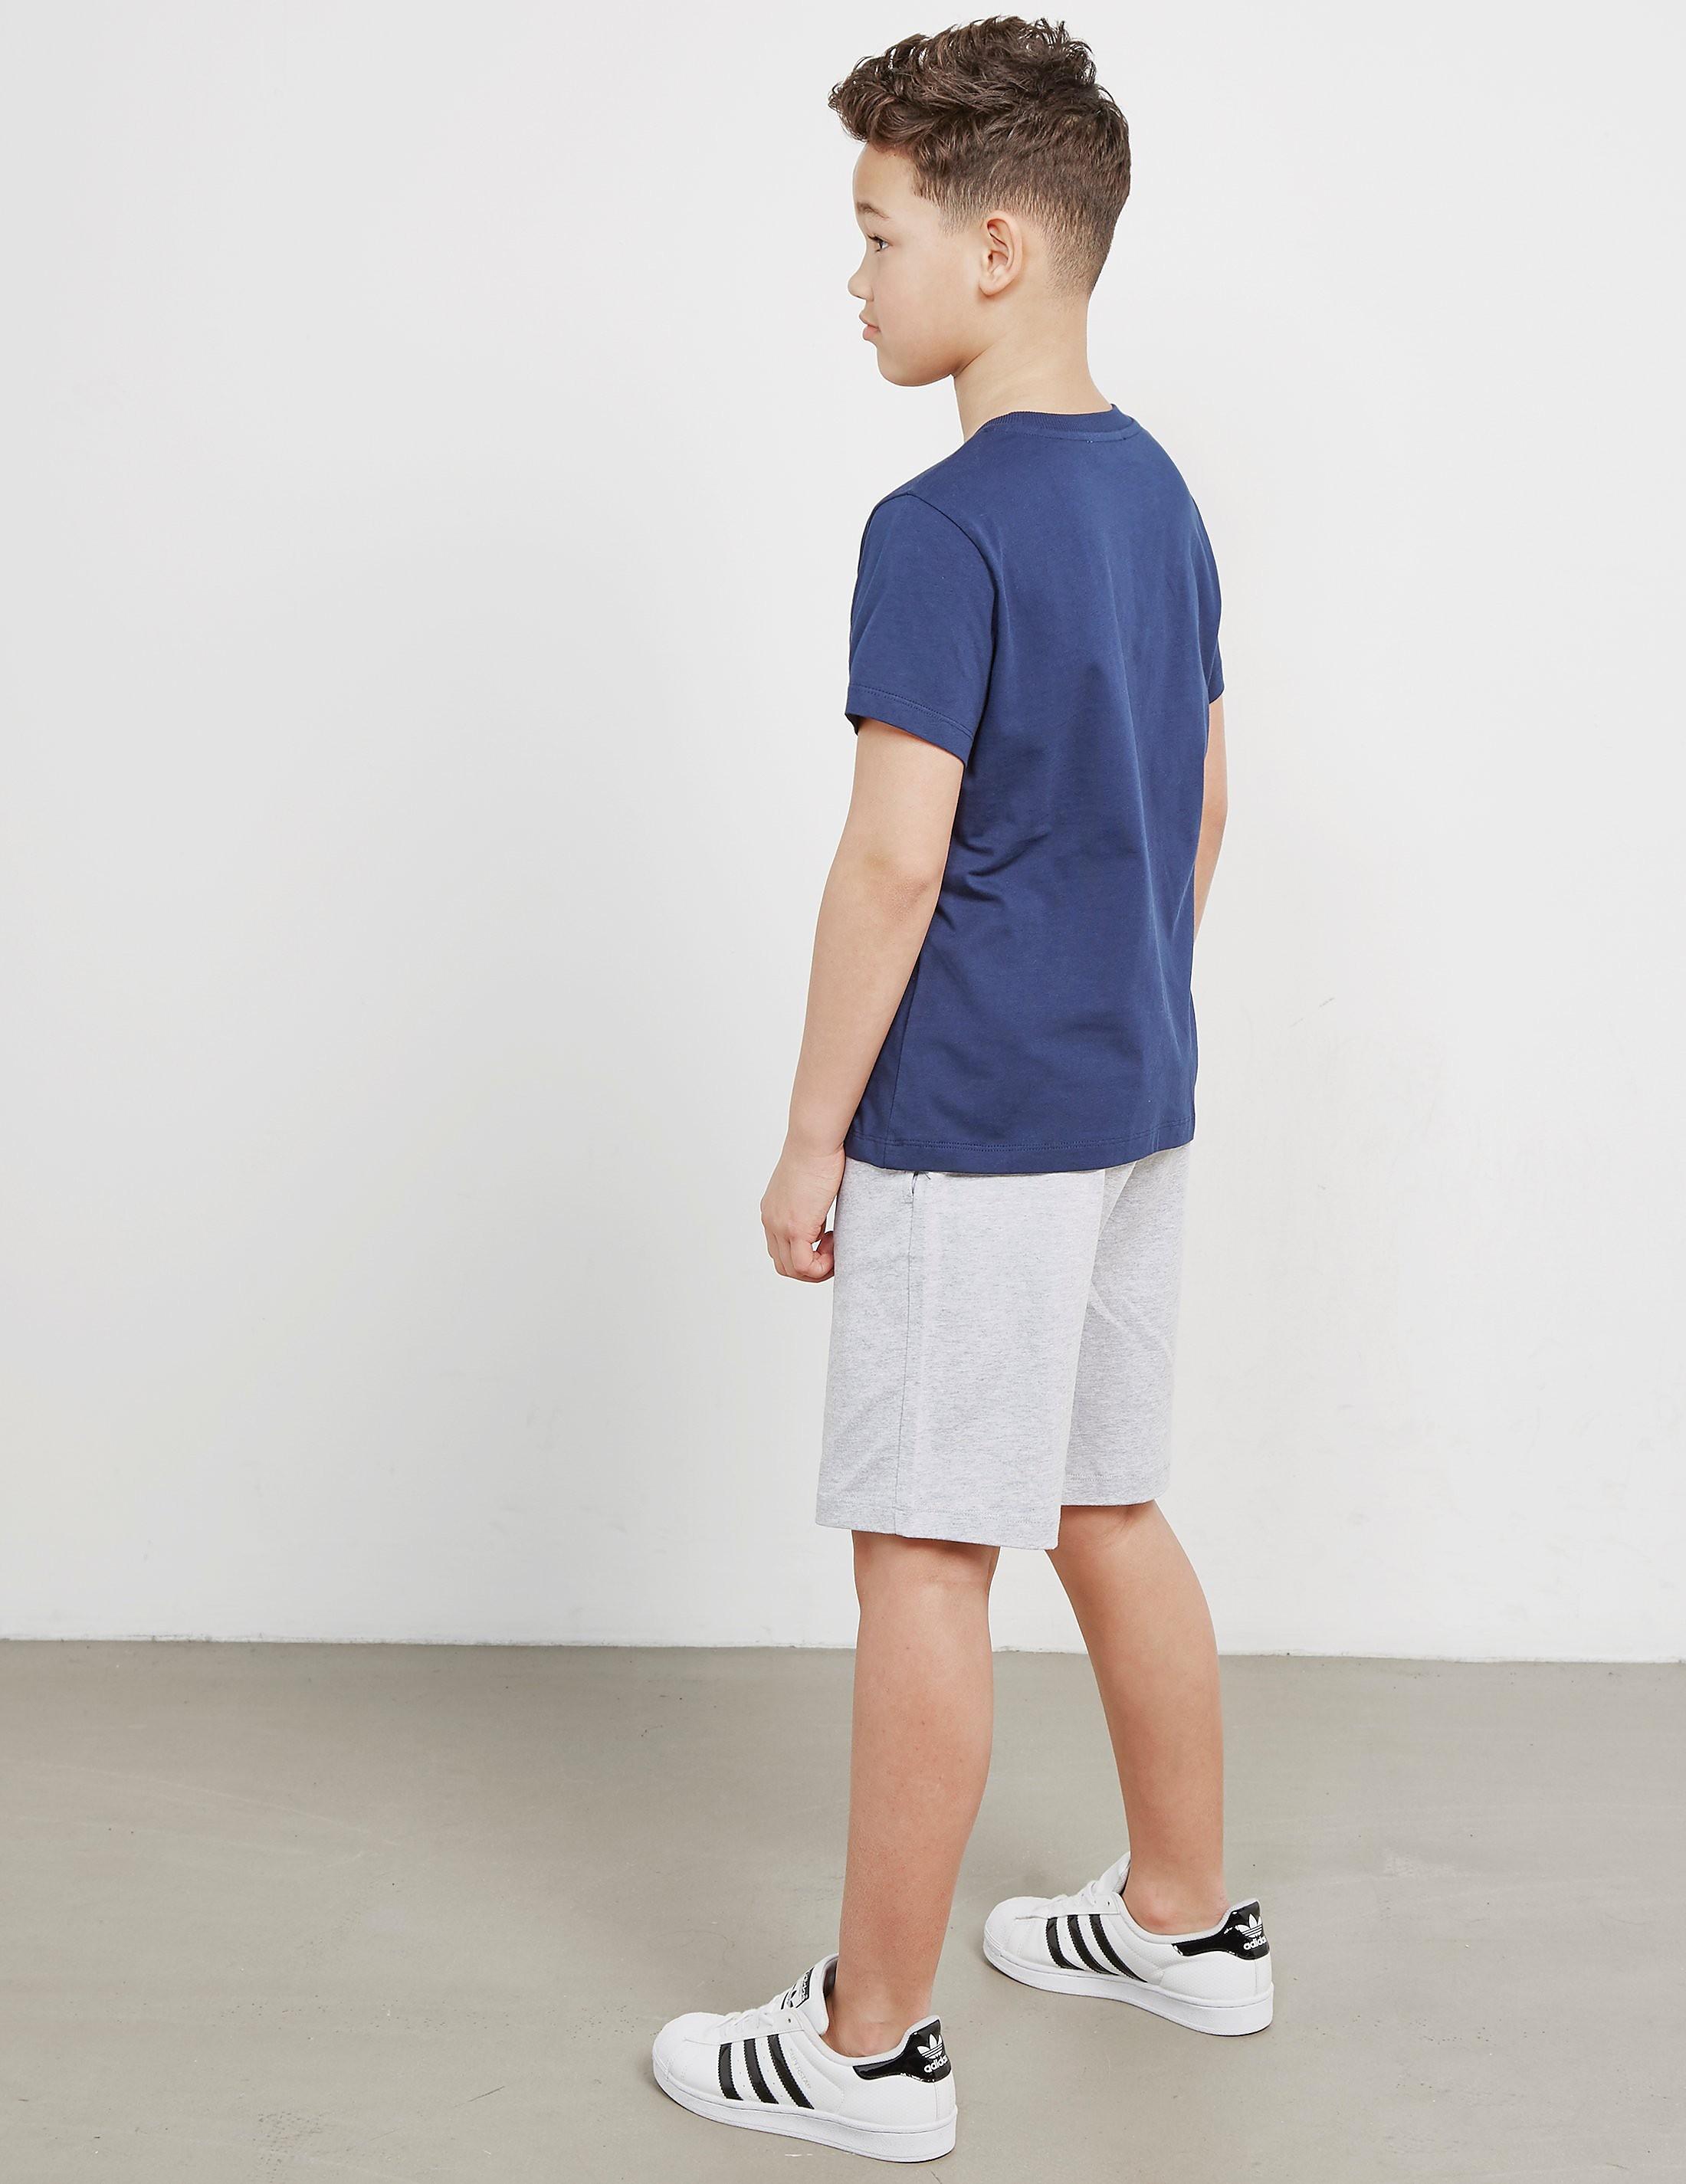 Moschino T-Shirt and Shorts Set